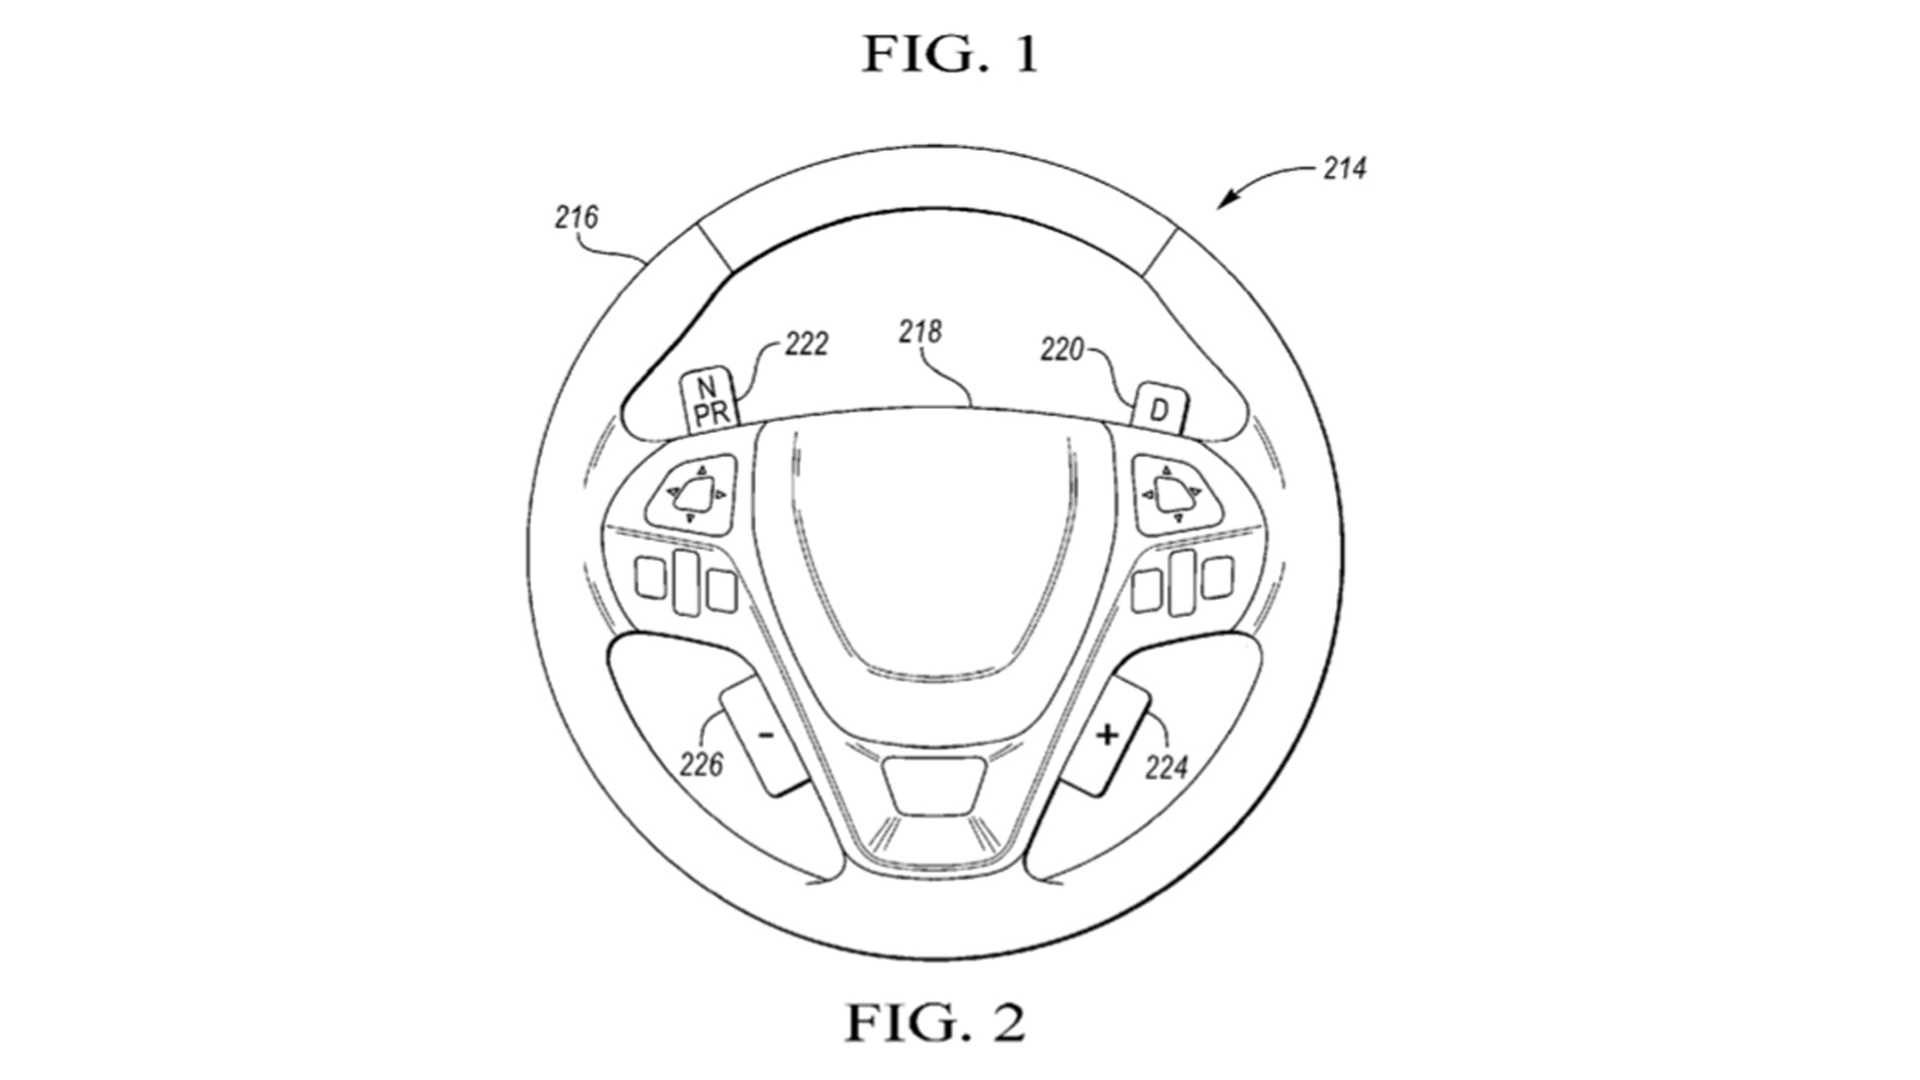 2000 Nissan Frontier Wiring Diagram 2000 Mercury Sable 30l Mfi Dohc